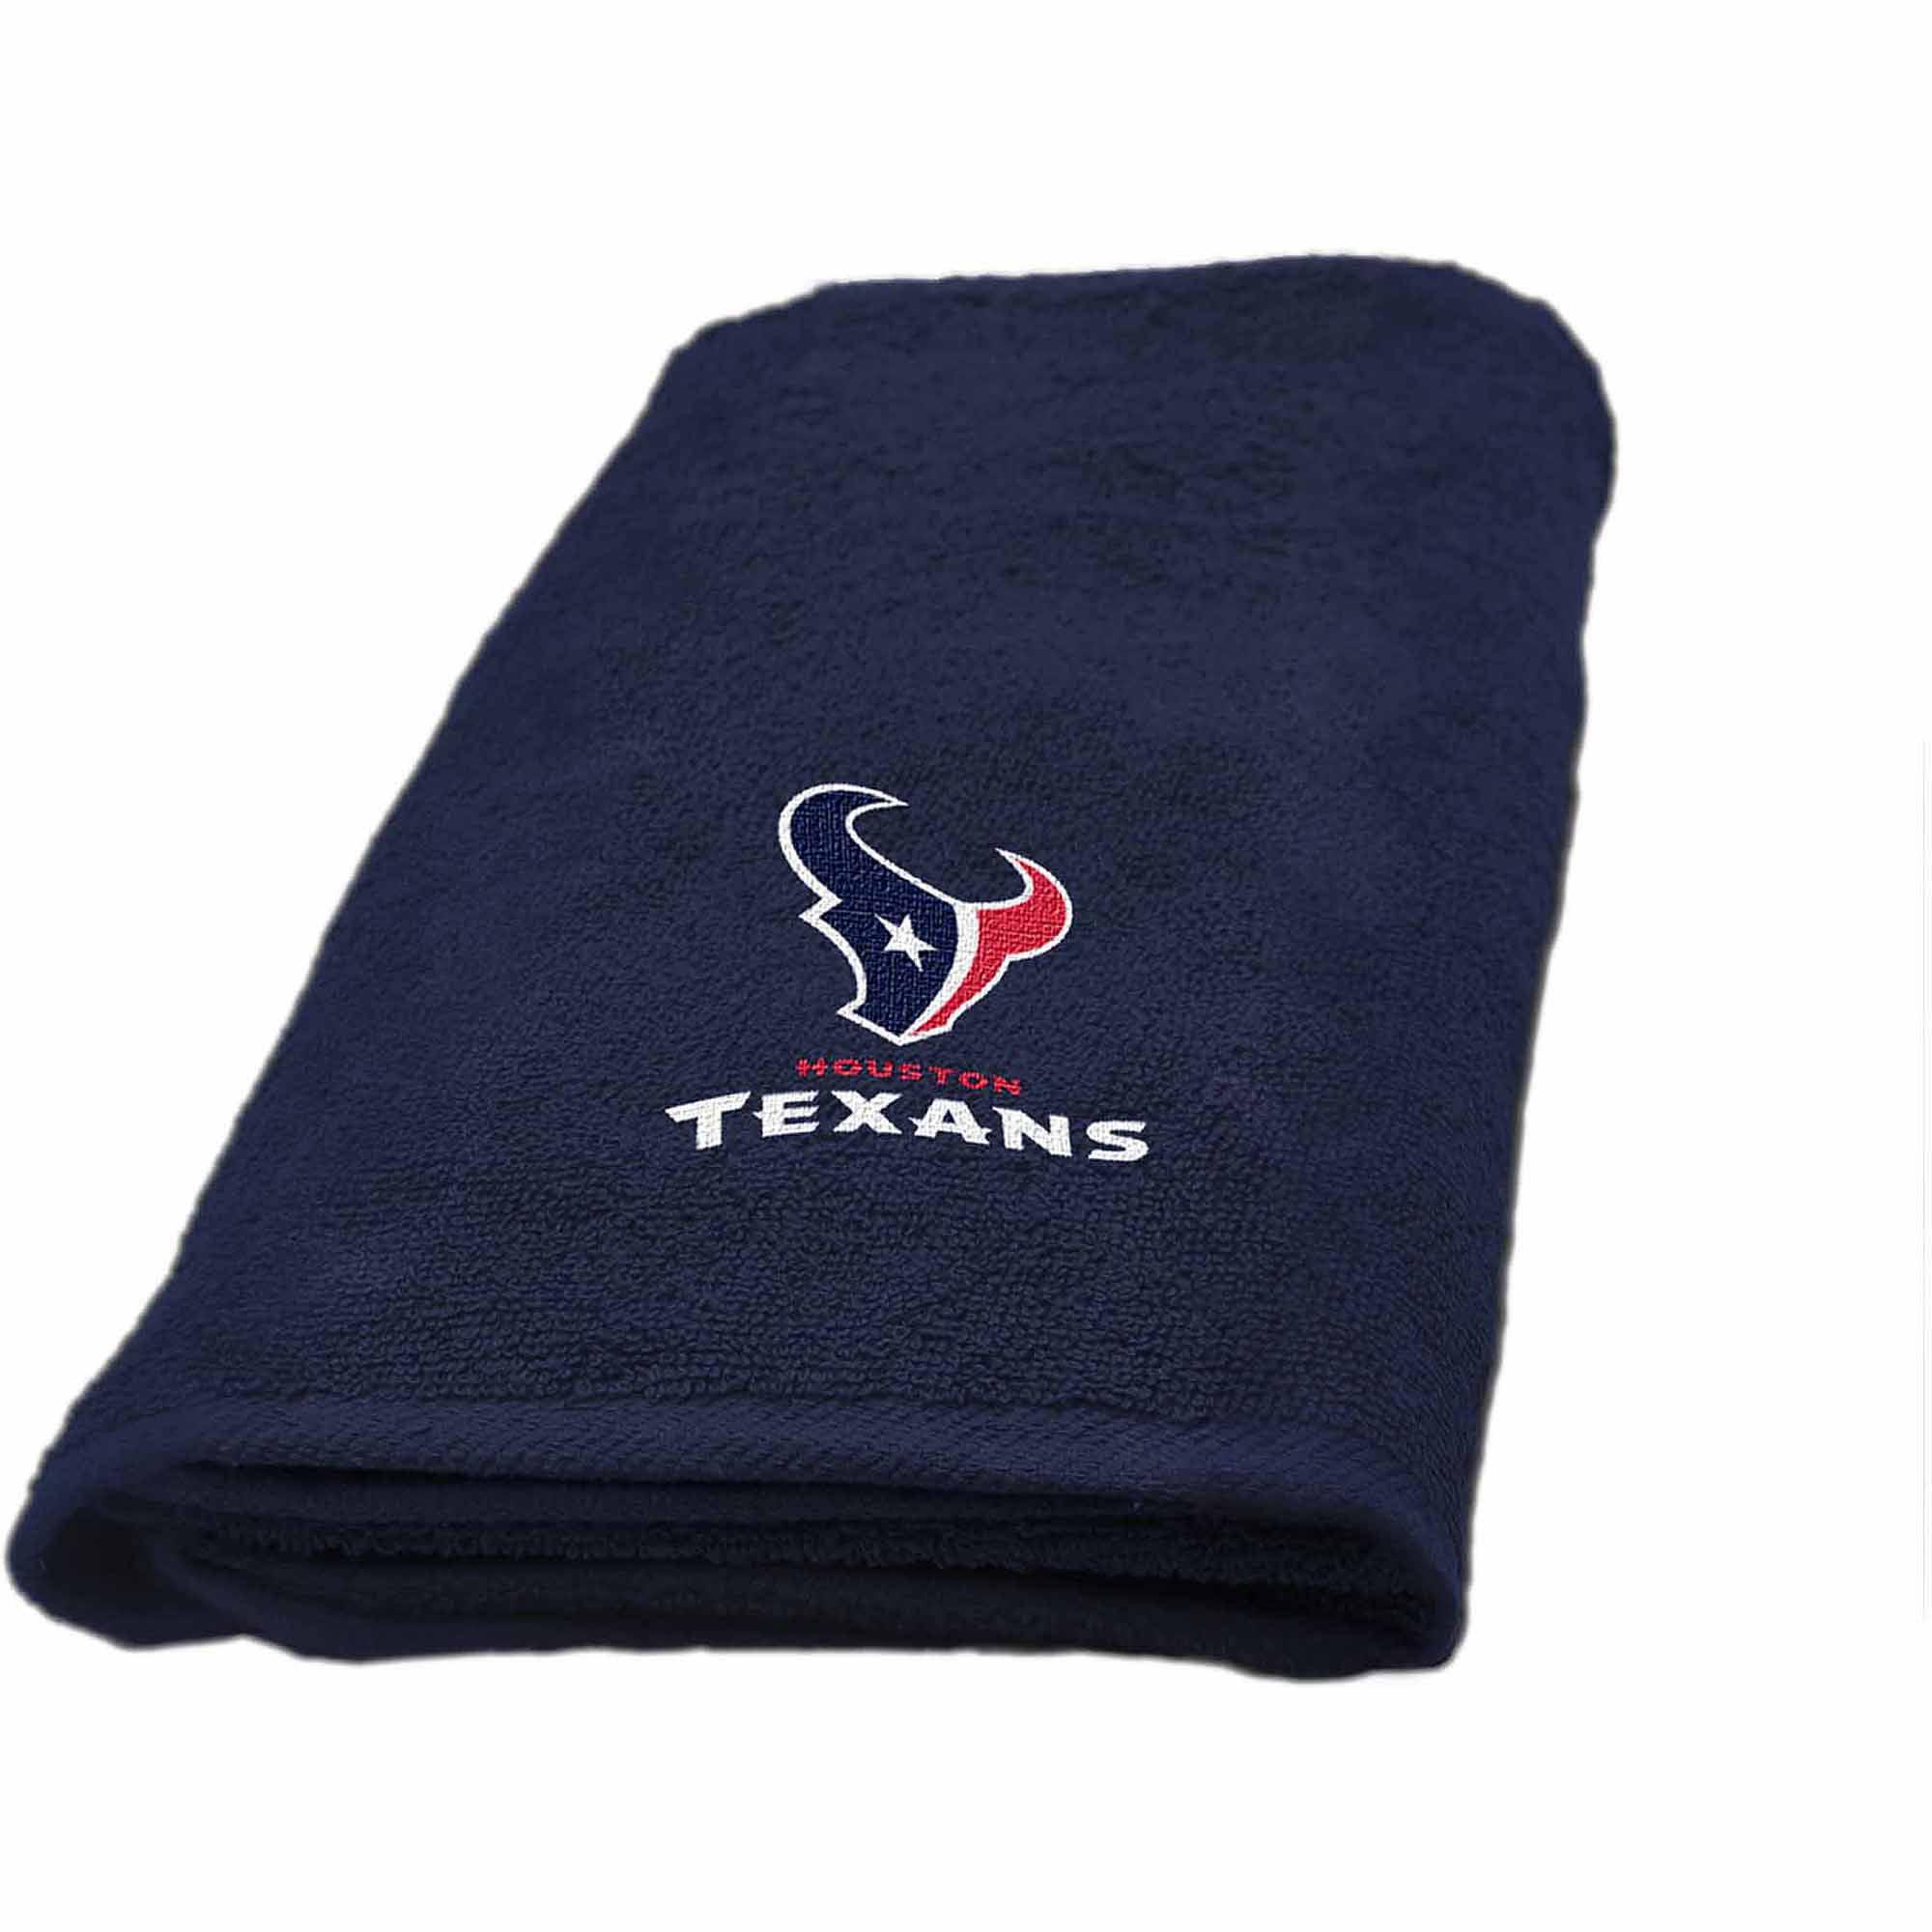 NFL Houston Texans Hand Towel - Walmart.com